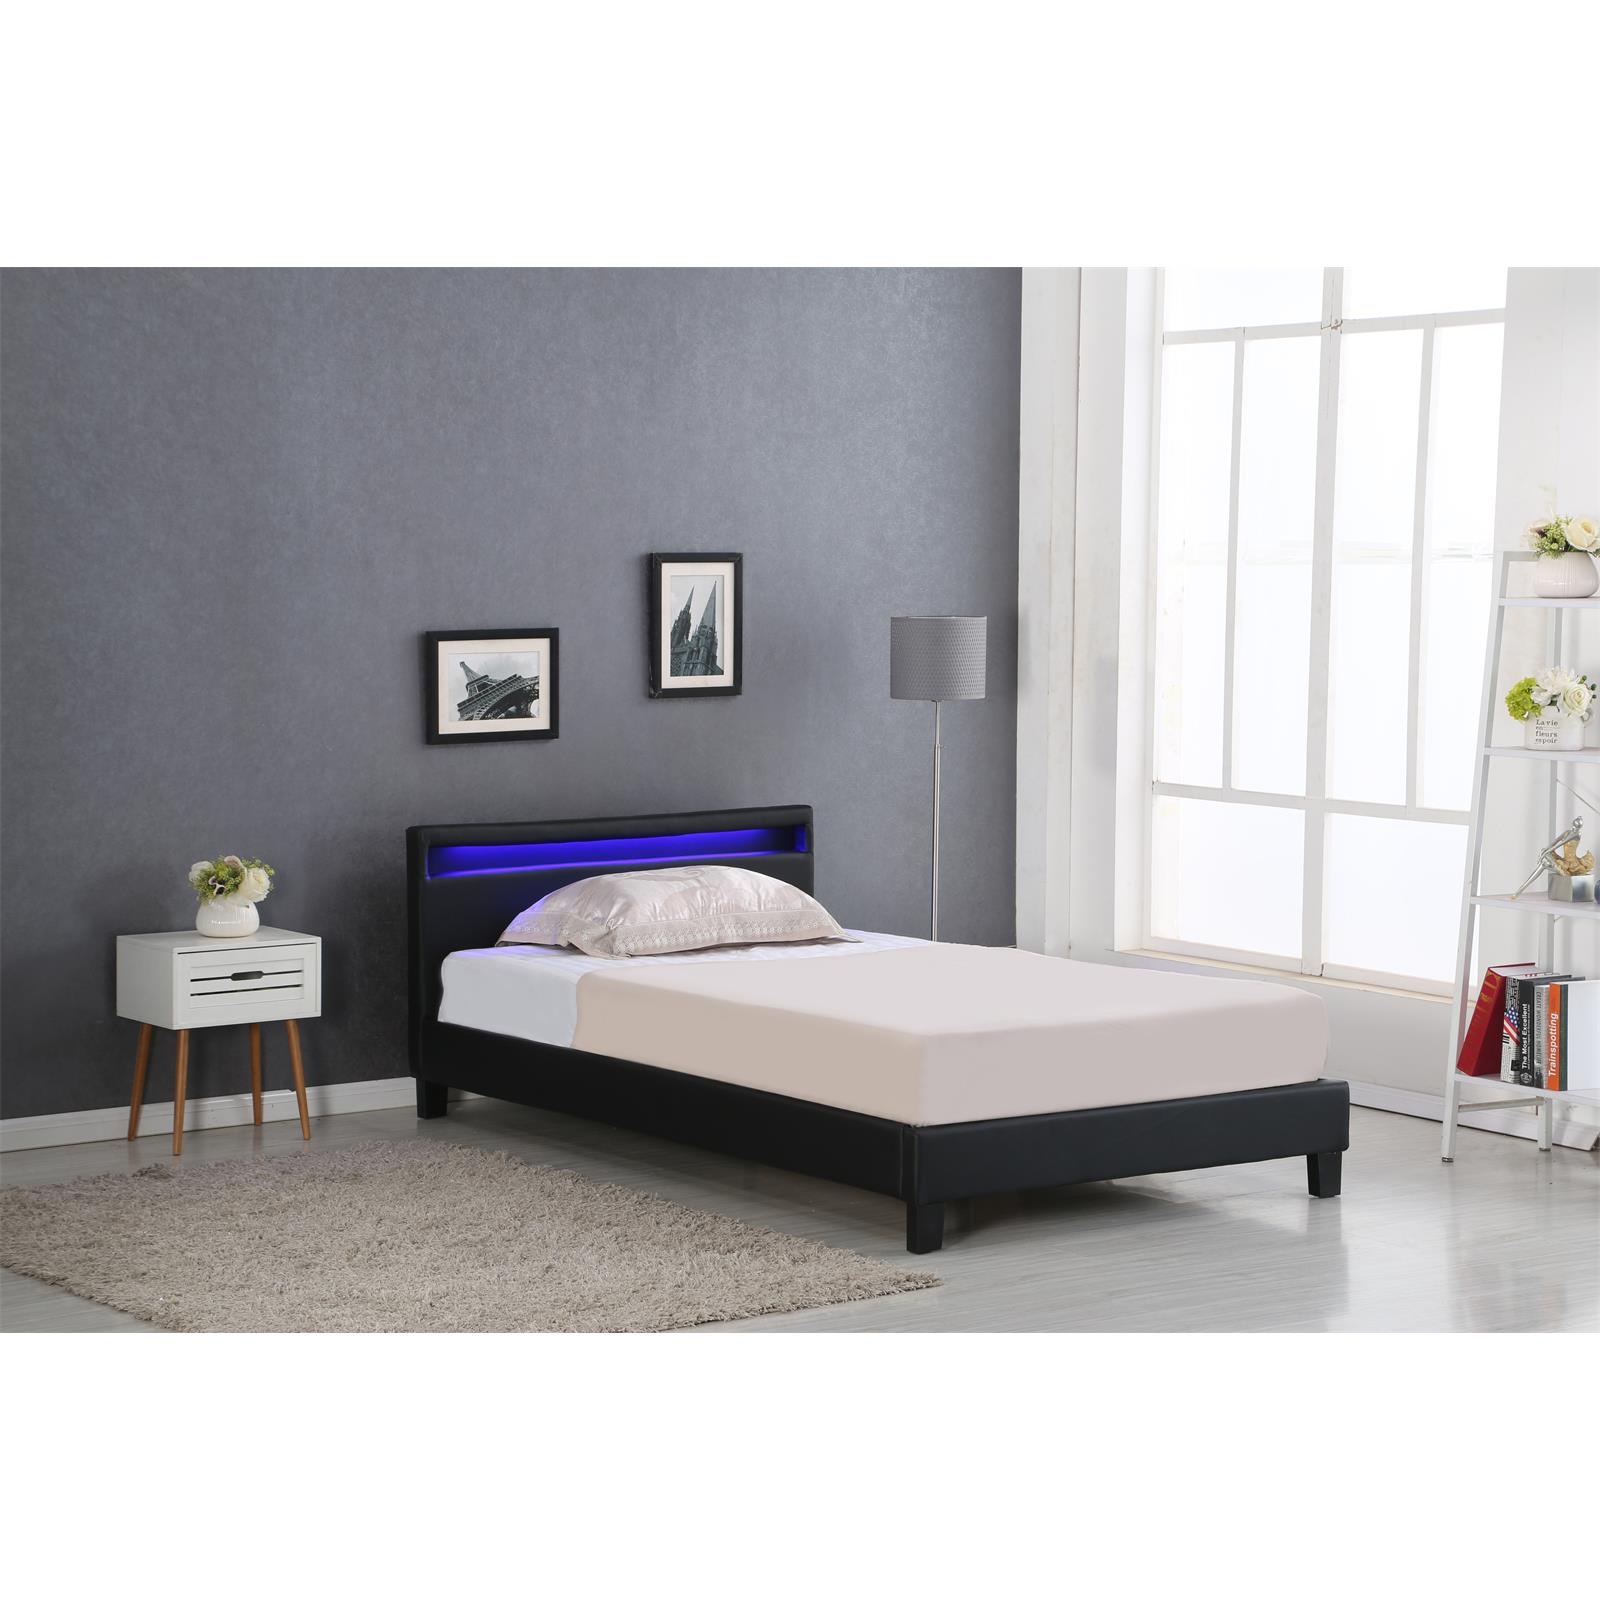 polsterbett mirasol mit led 120 x 200 cm inkl lattenrost caro m bel. Black Bedroom Furniture Sets. Home Design Ideas